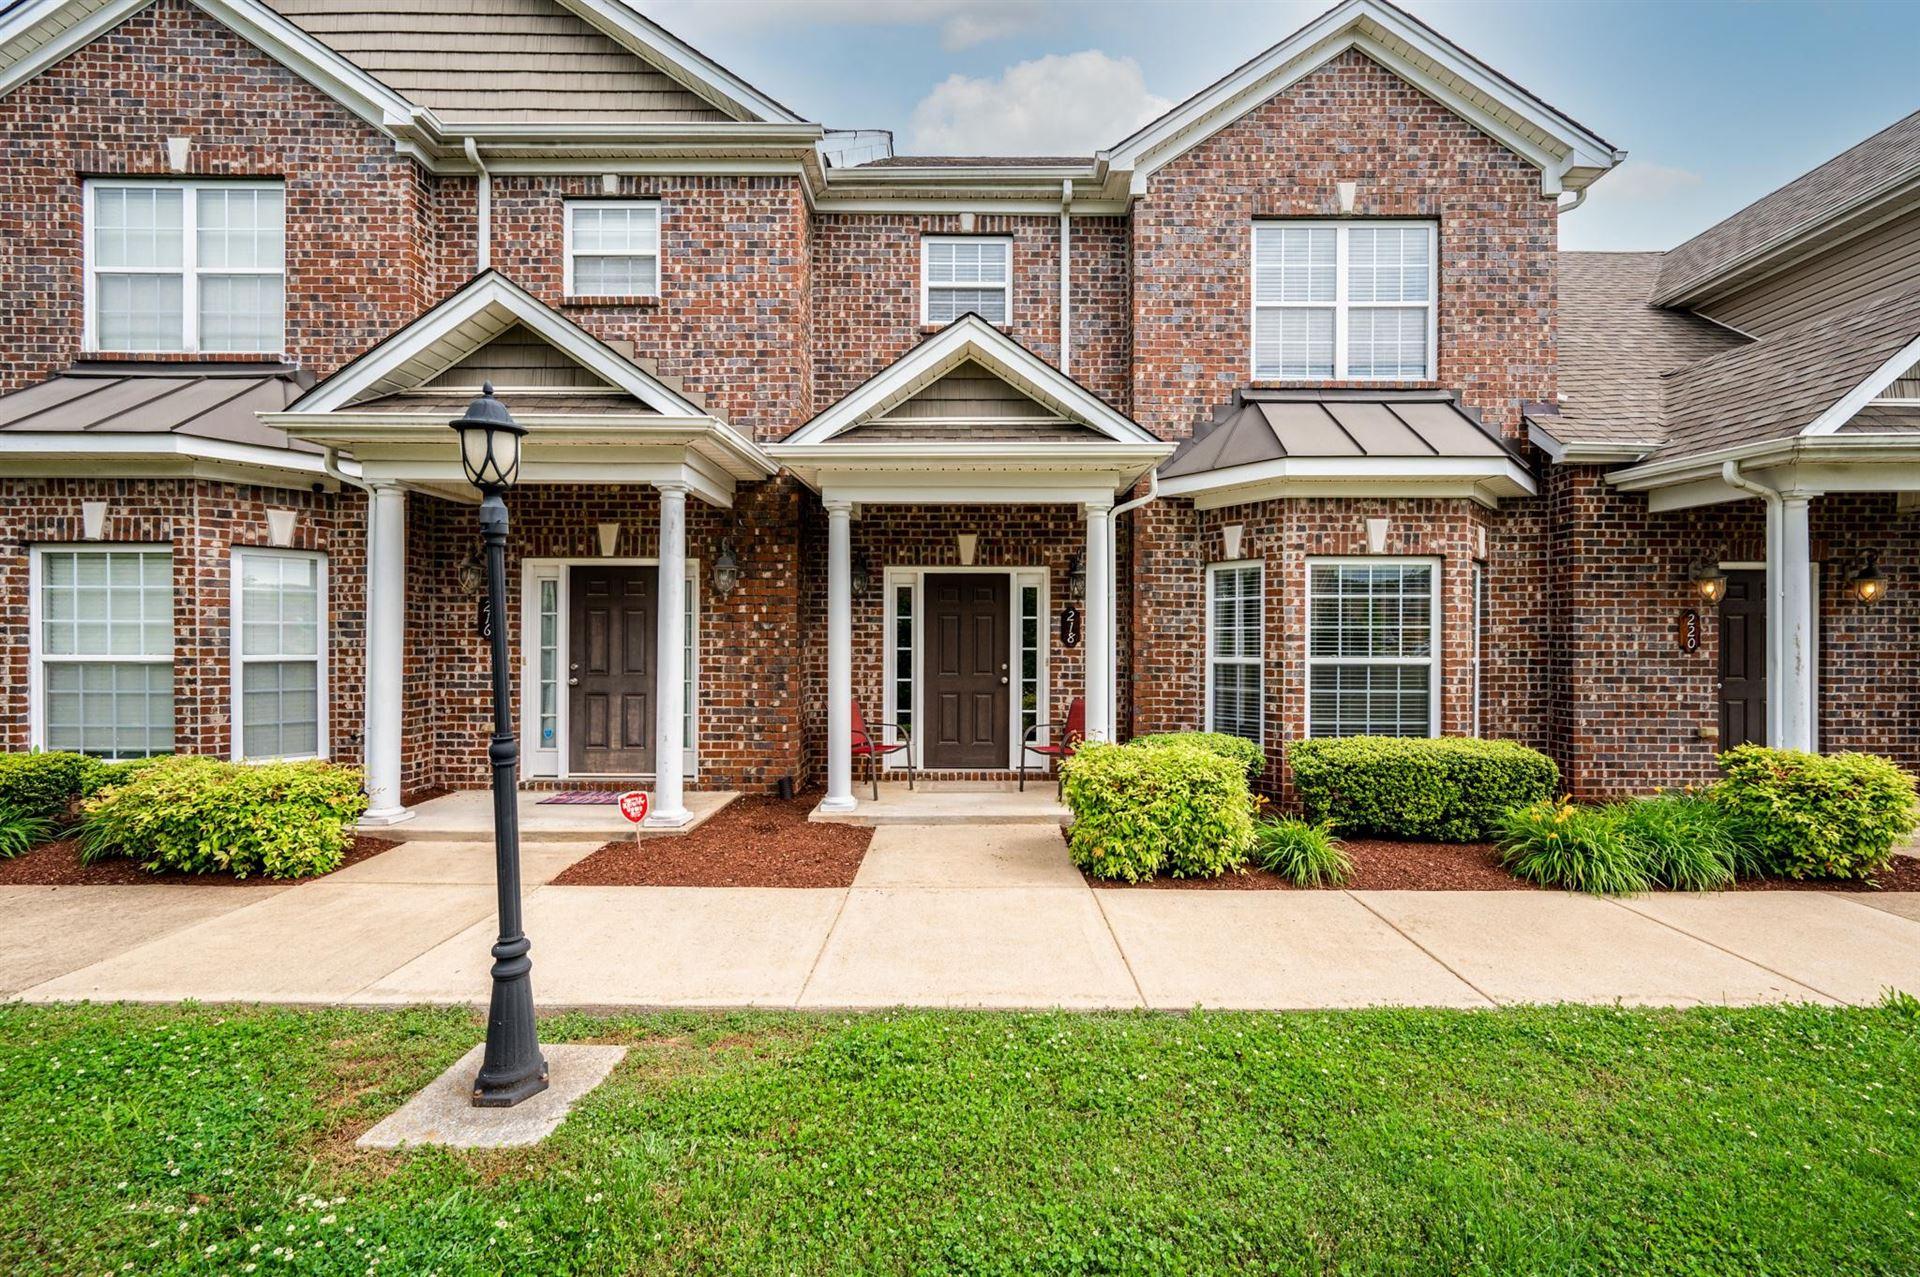 218 Rowlette Circle, Murfreesboro, TN 37127 - MLS#: 2252820